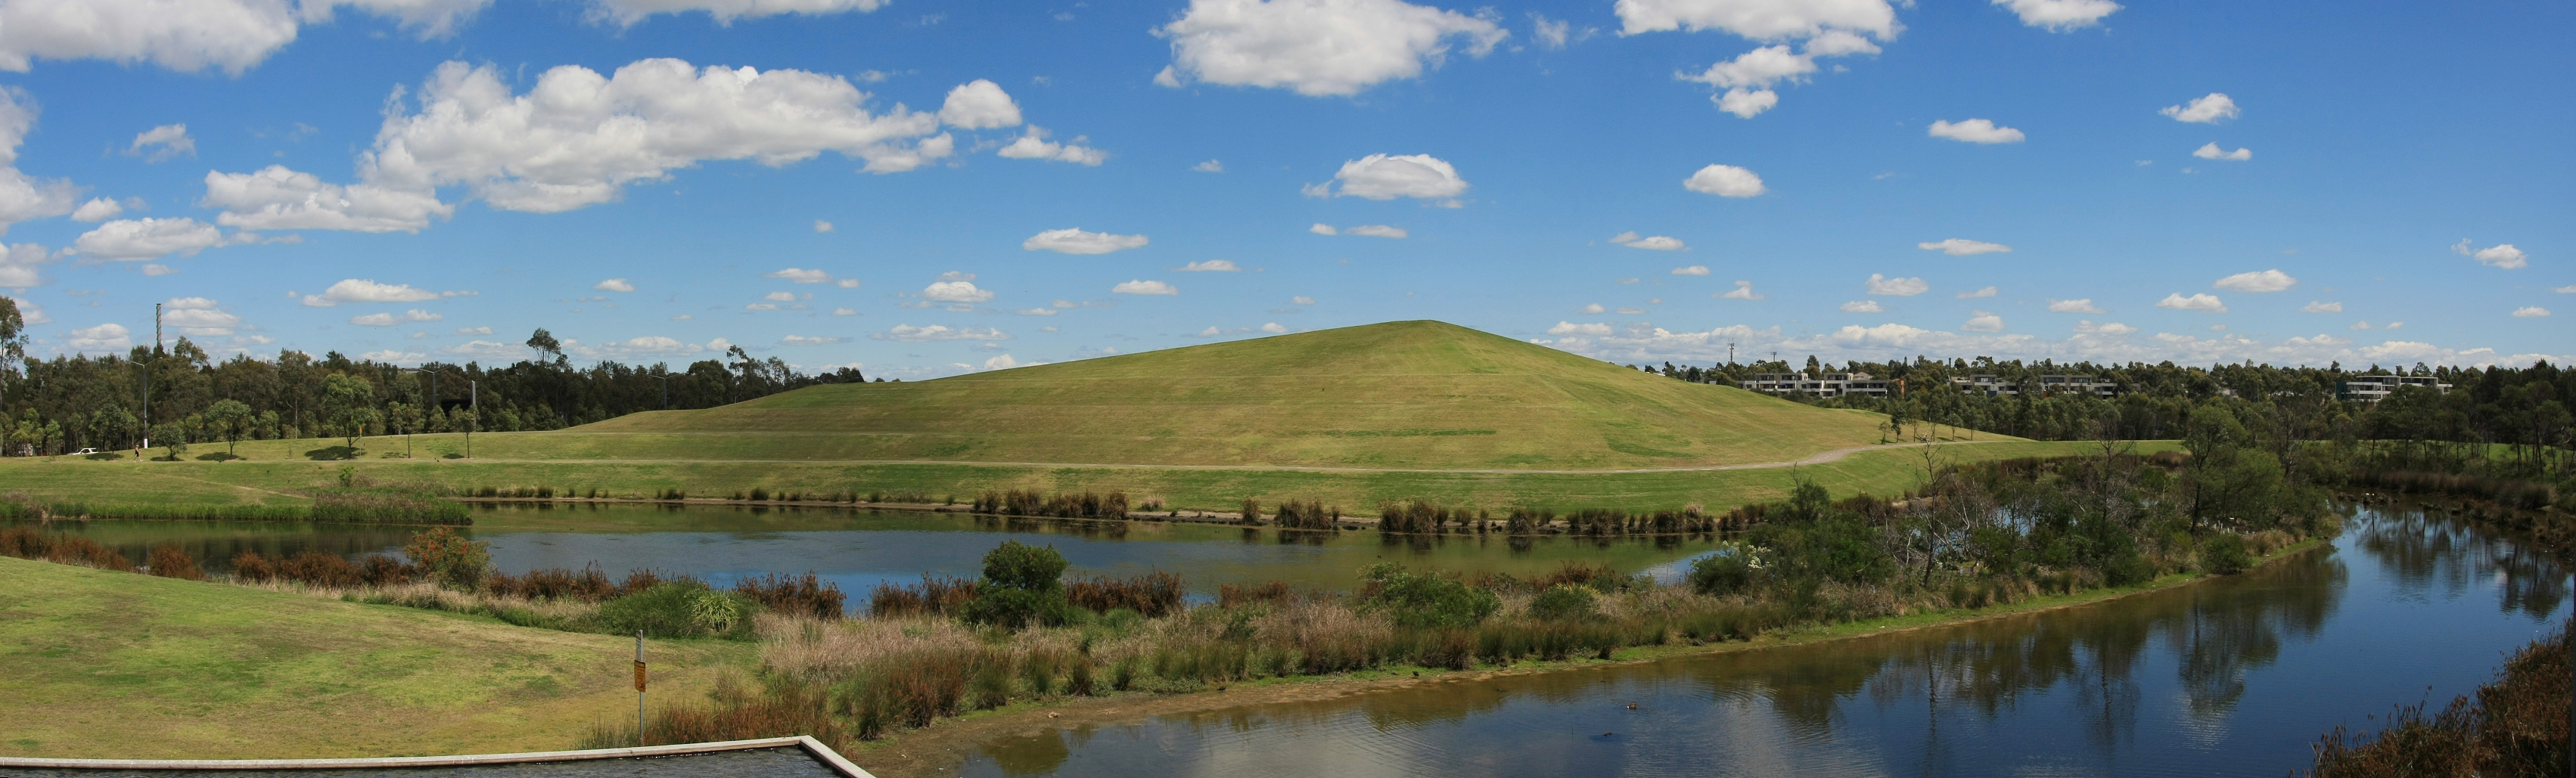 File:Syd olympic park landscape.jpg - Wikimedia Commons